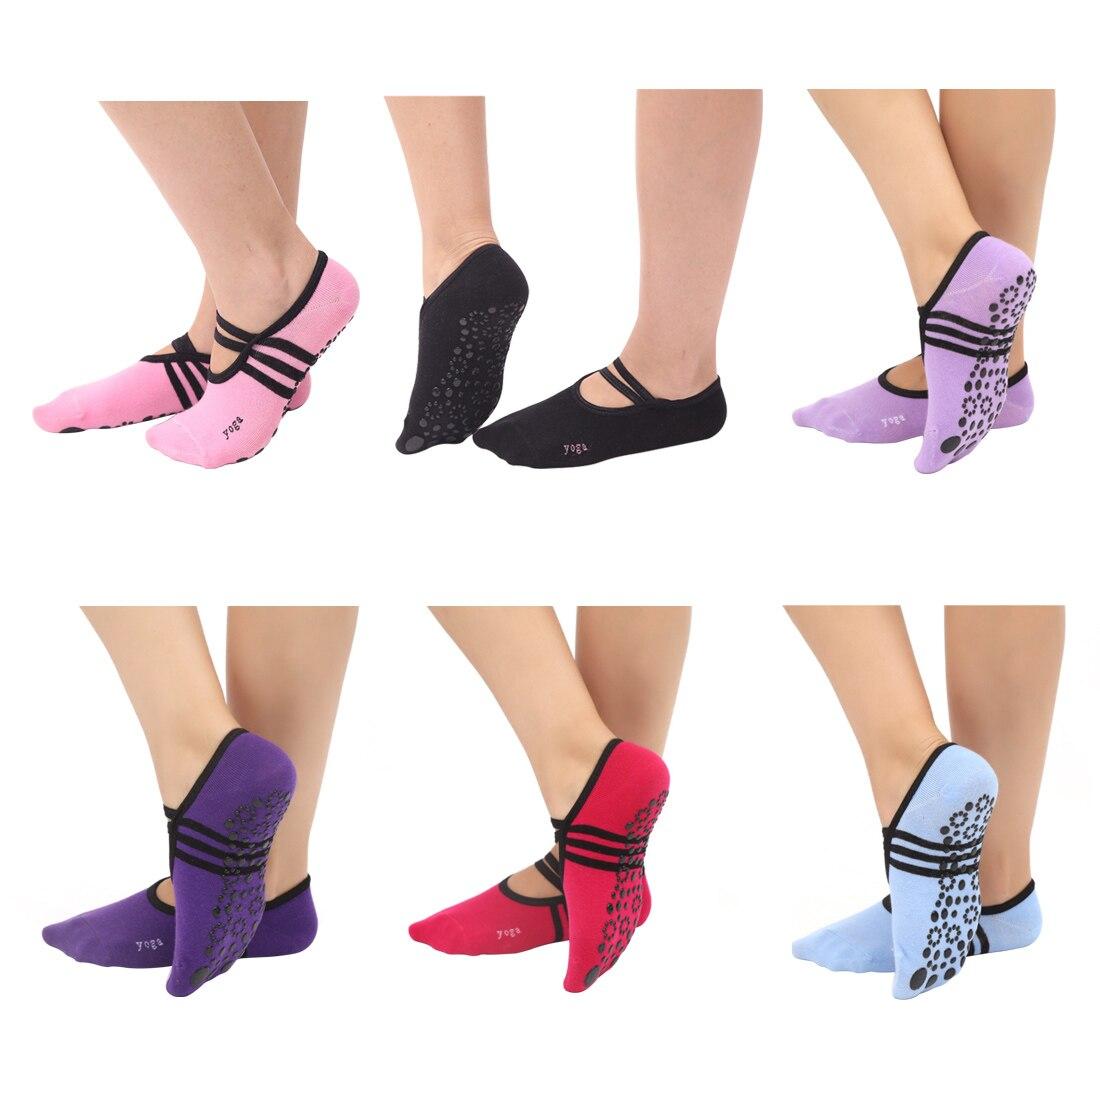 Women Anti Slip Bandage Cotton Sports Yoga Socks Ladies Ventilation Pilates Ballet Socks Dance Sock Slippers